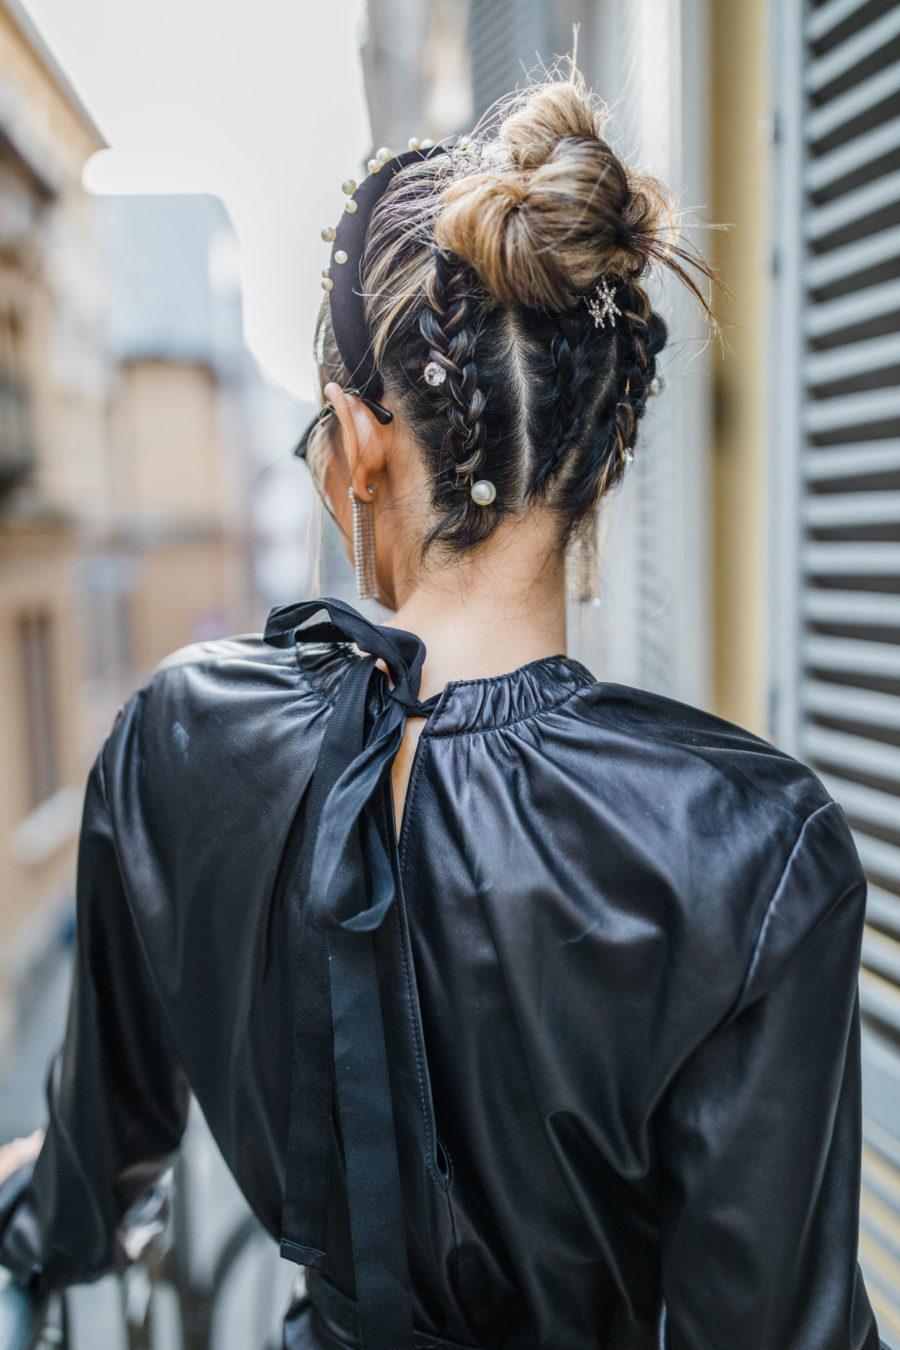 hair clips trend fashion week 2020 // Notjessfashion.com